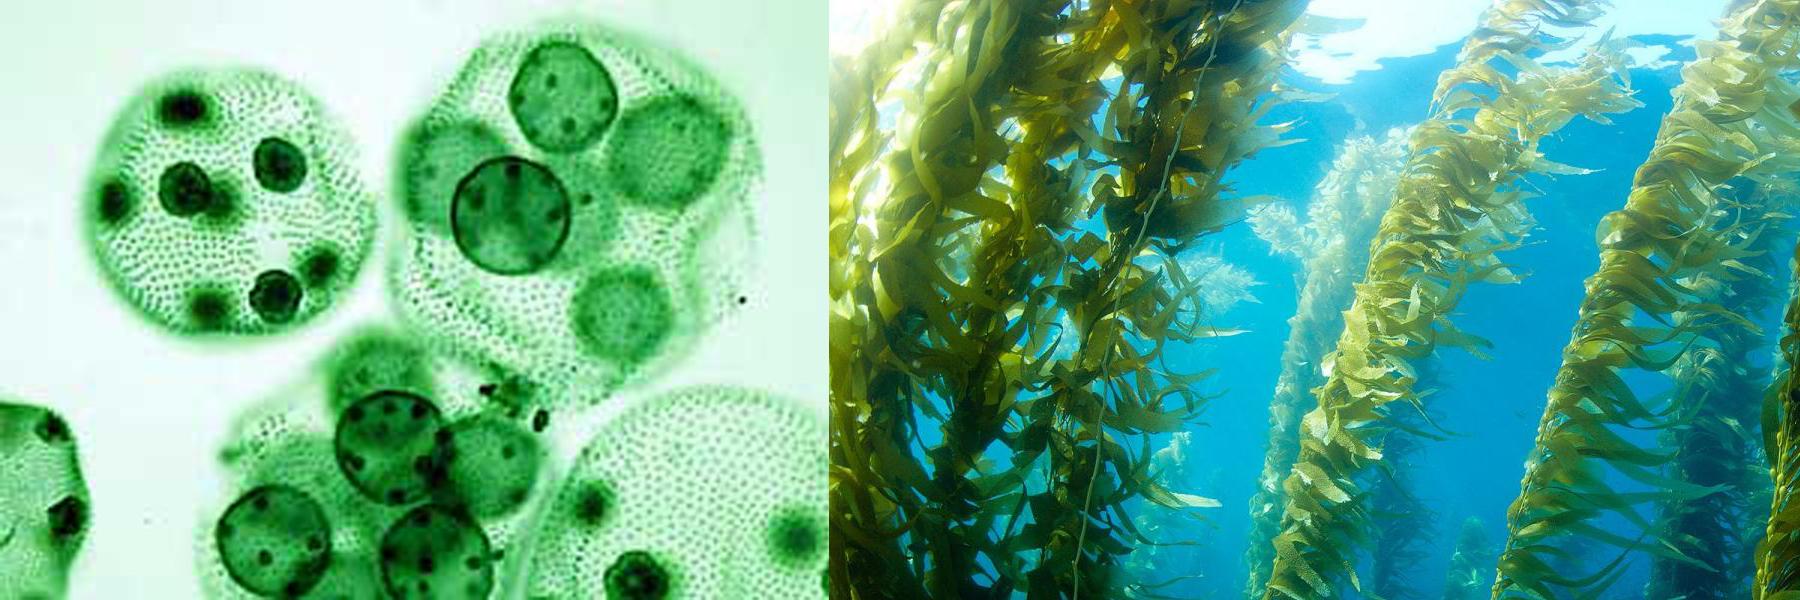 eencellige_alg_en_kelp